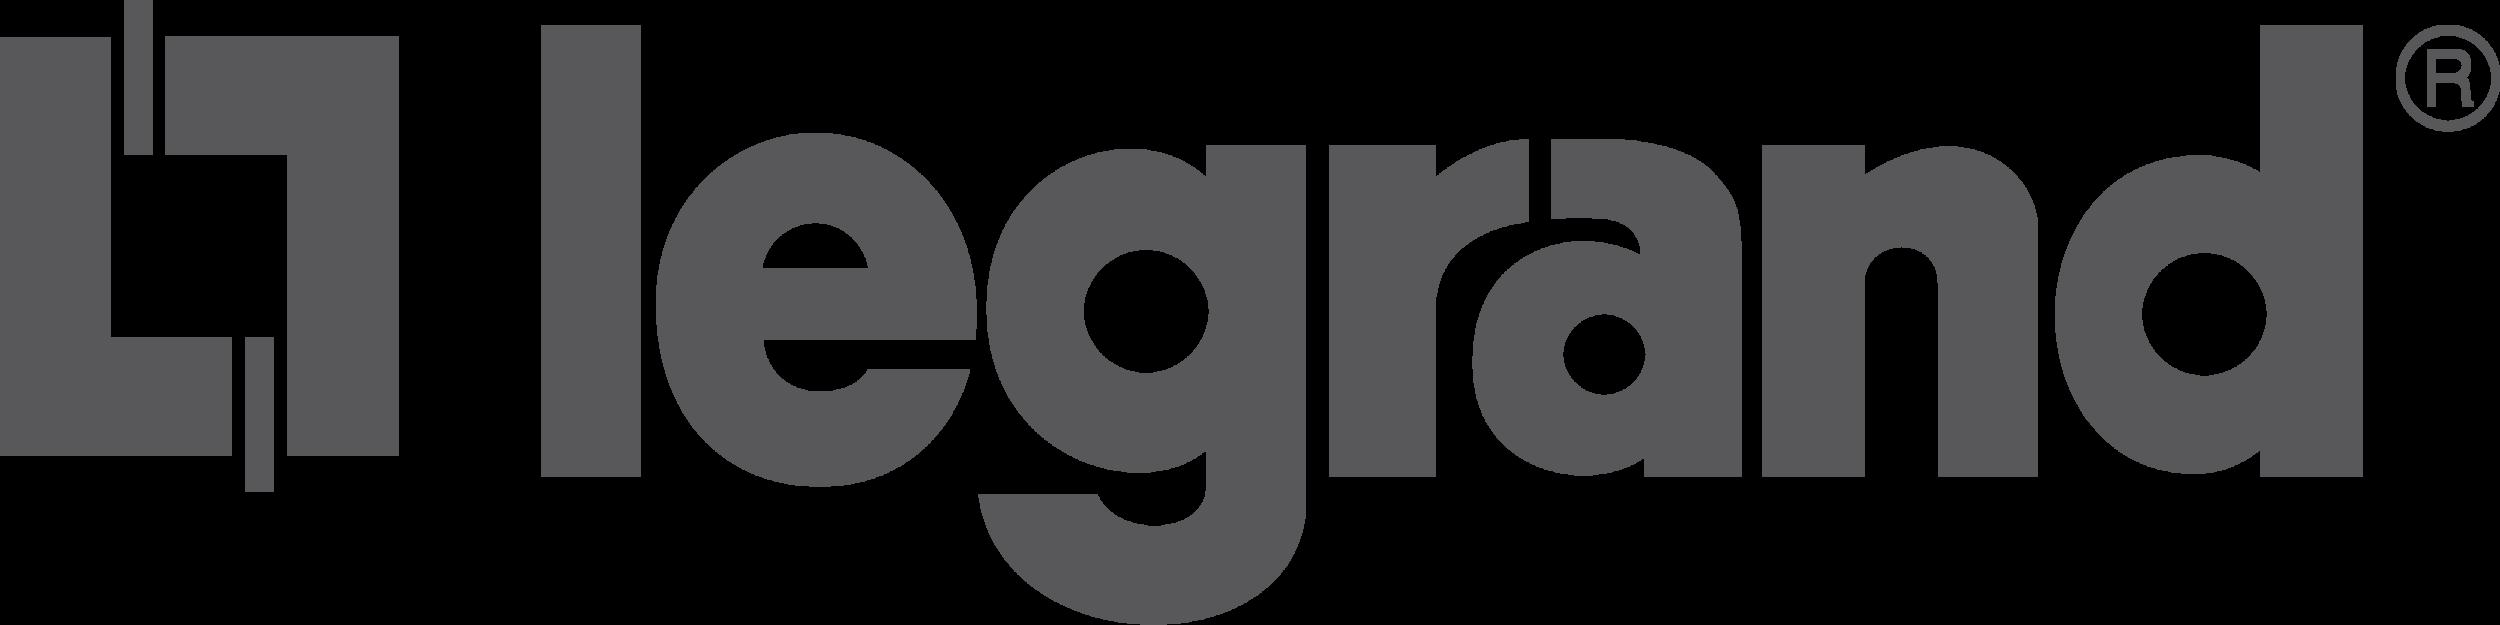 Legrand-Charcoal-PNG.png